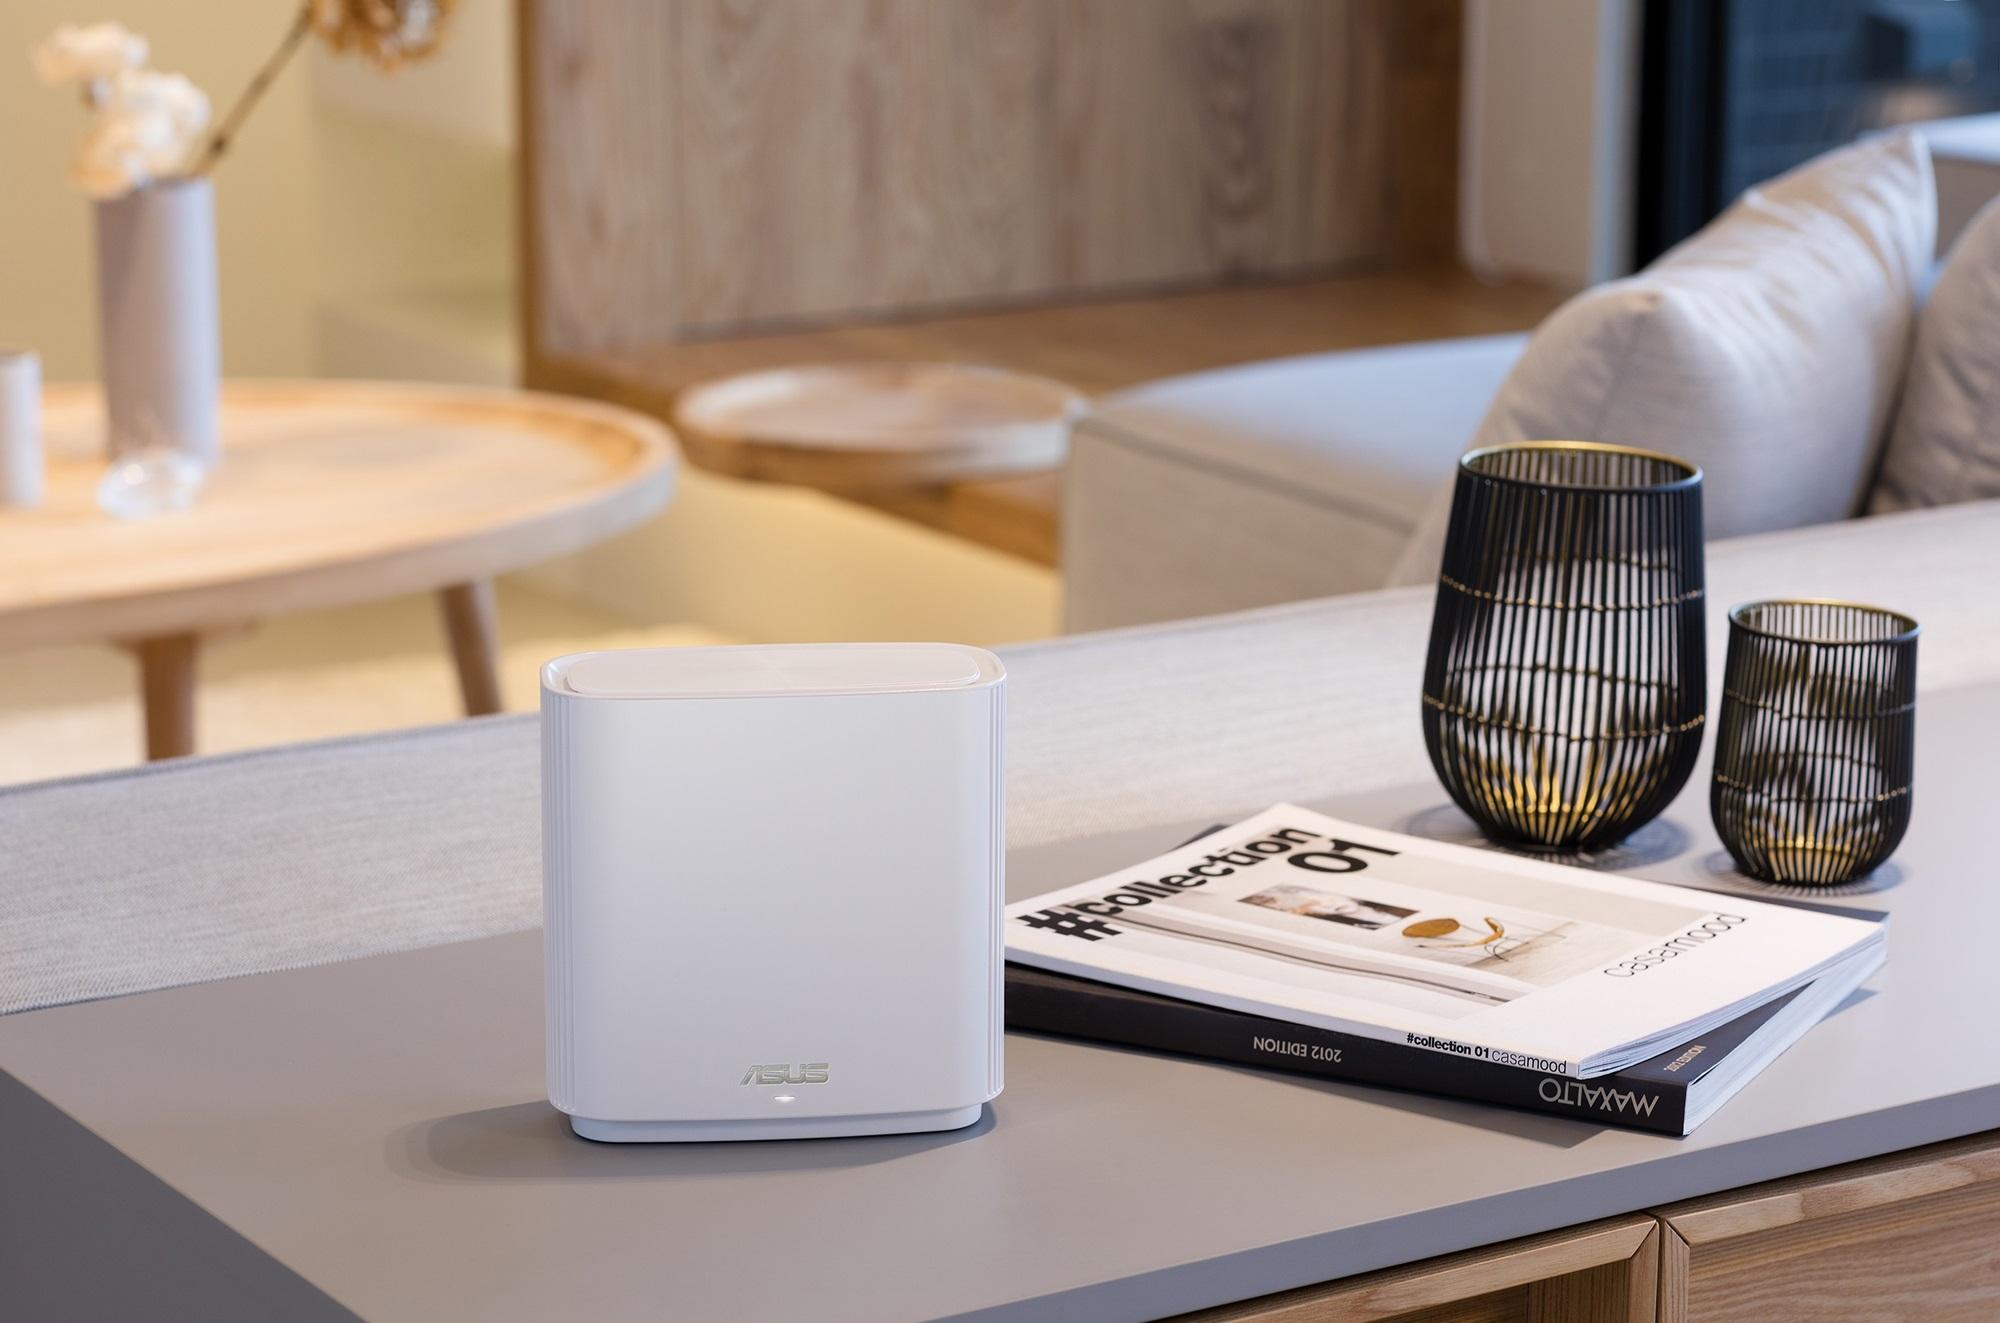 ASUS-ZenWiFi-AC (CT8)全新推出冰心白配色,其內蘊強大的Mesh-Wi-Fi連網能力,讓用戶盡享快速穩定且零死角的無線連網體驗。